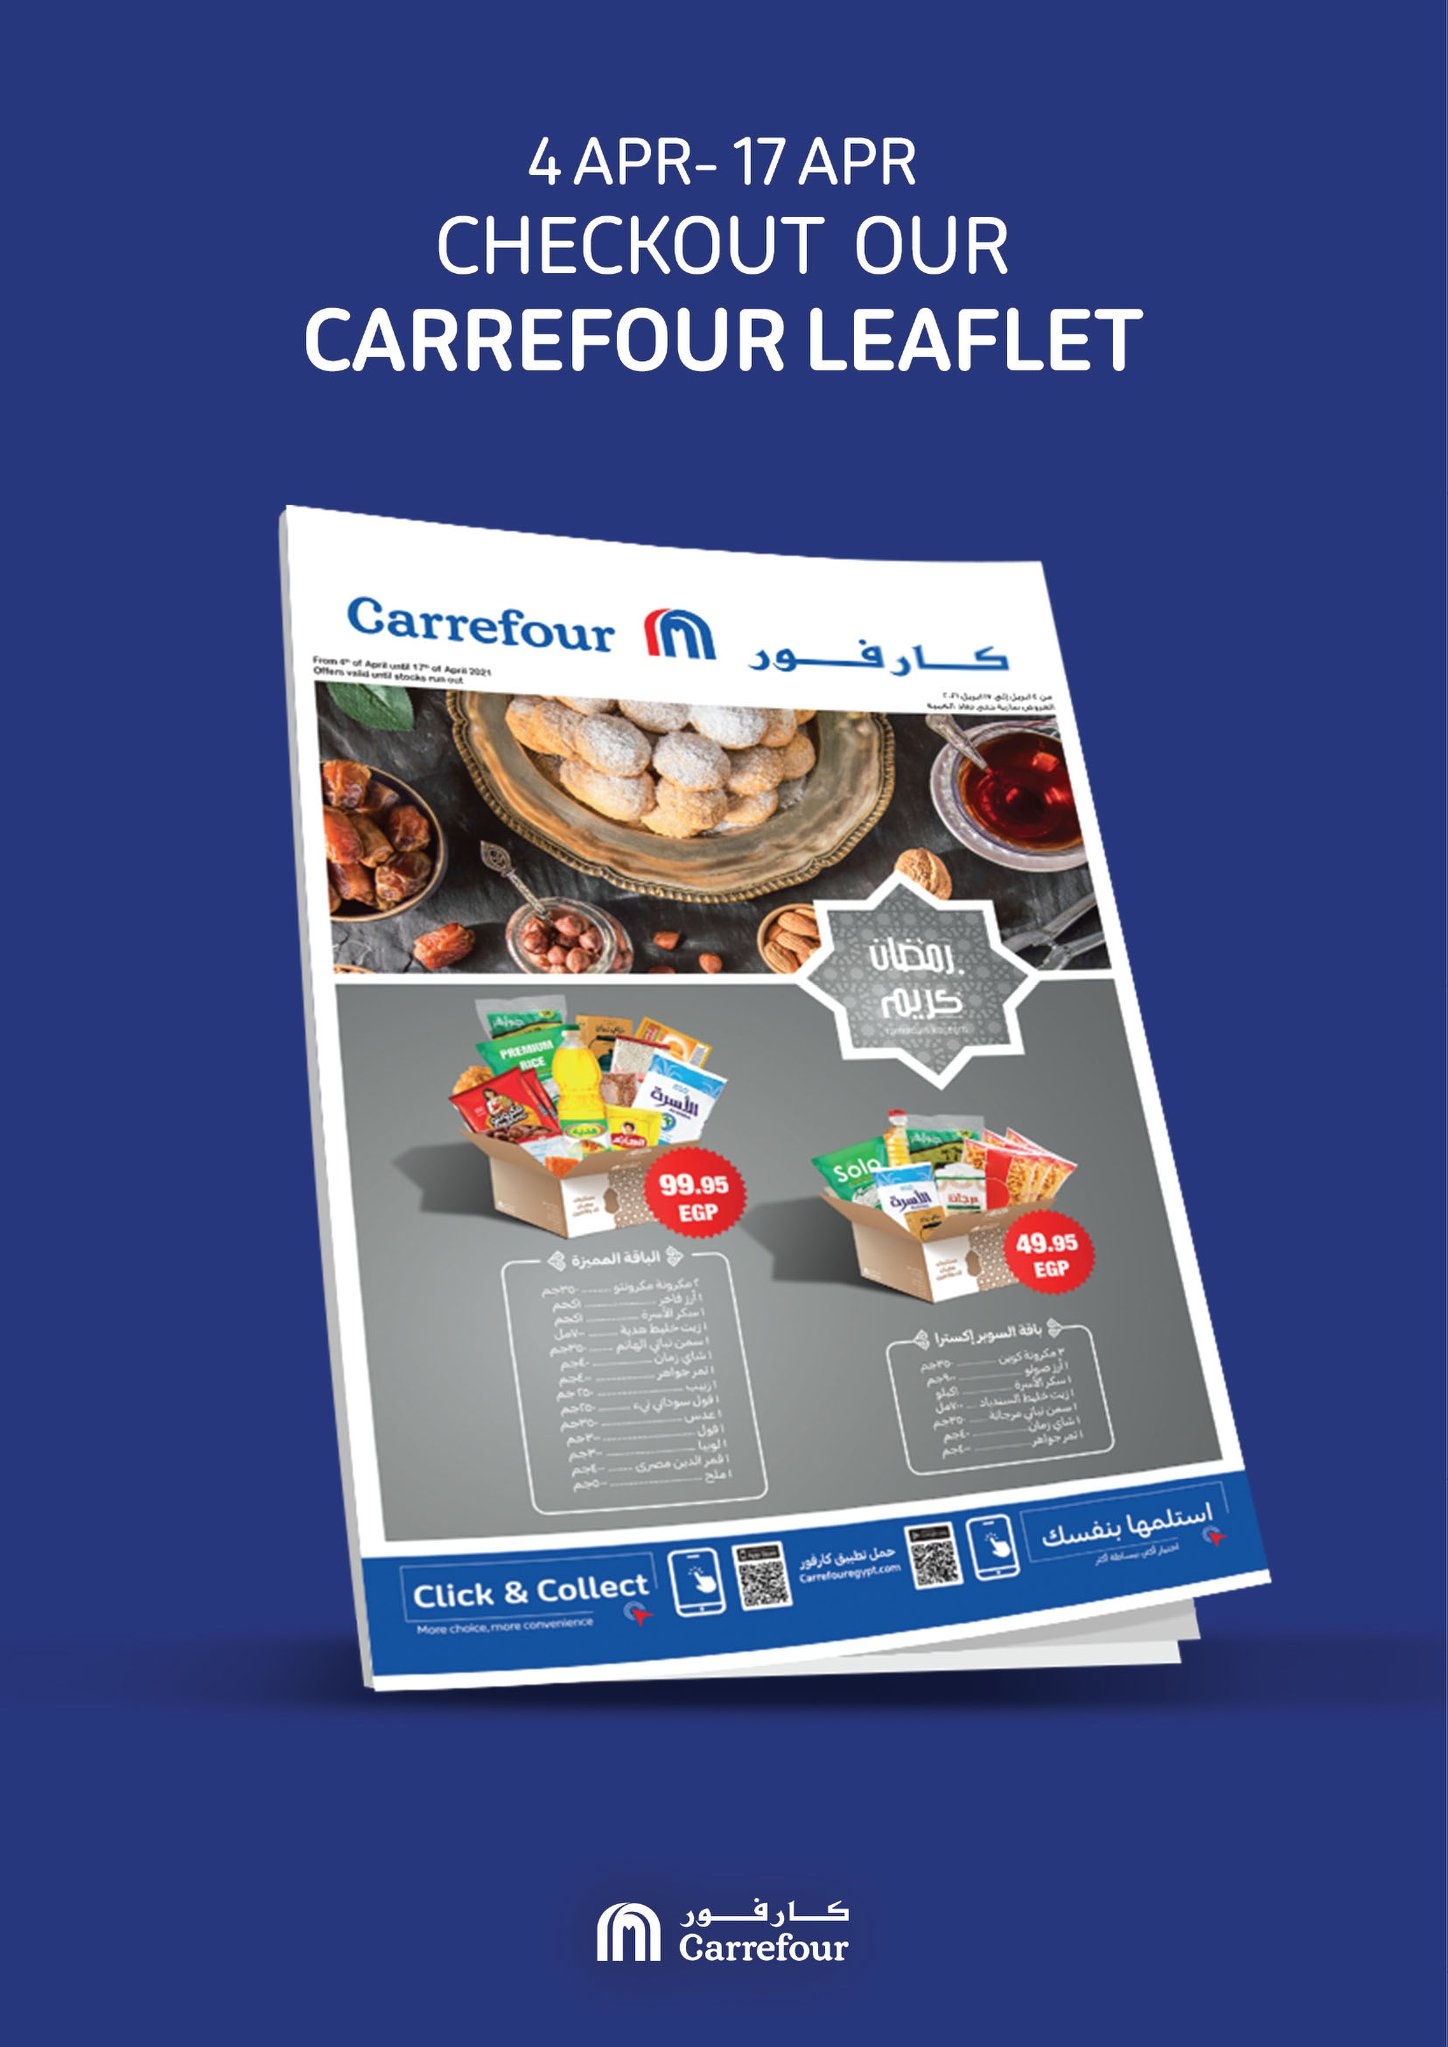 عروض كارفور مصر من 4 ابريل حتى 17 ابريل 2021 عروض رمضان 2021